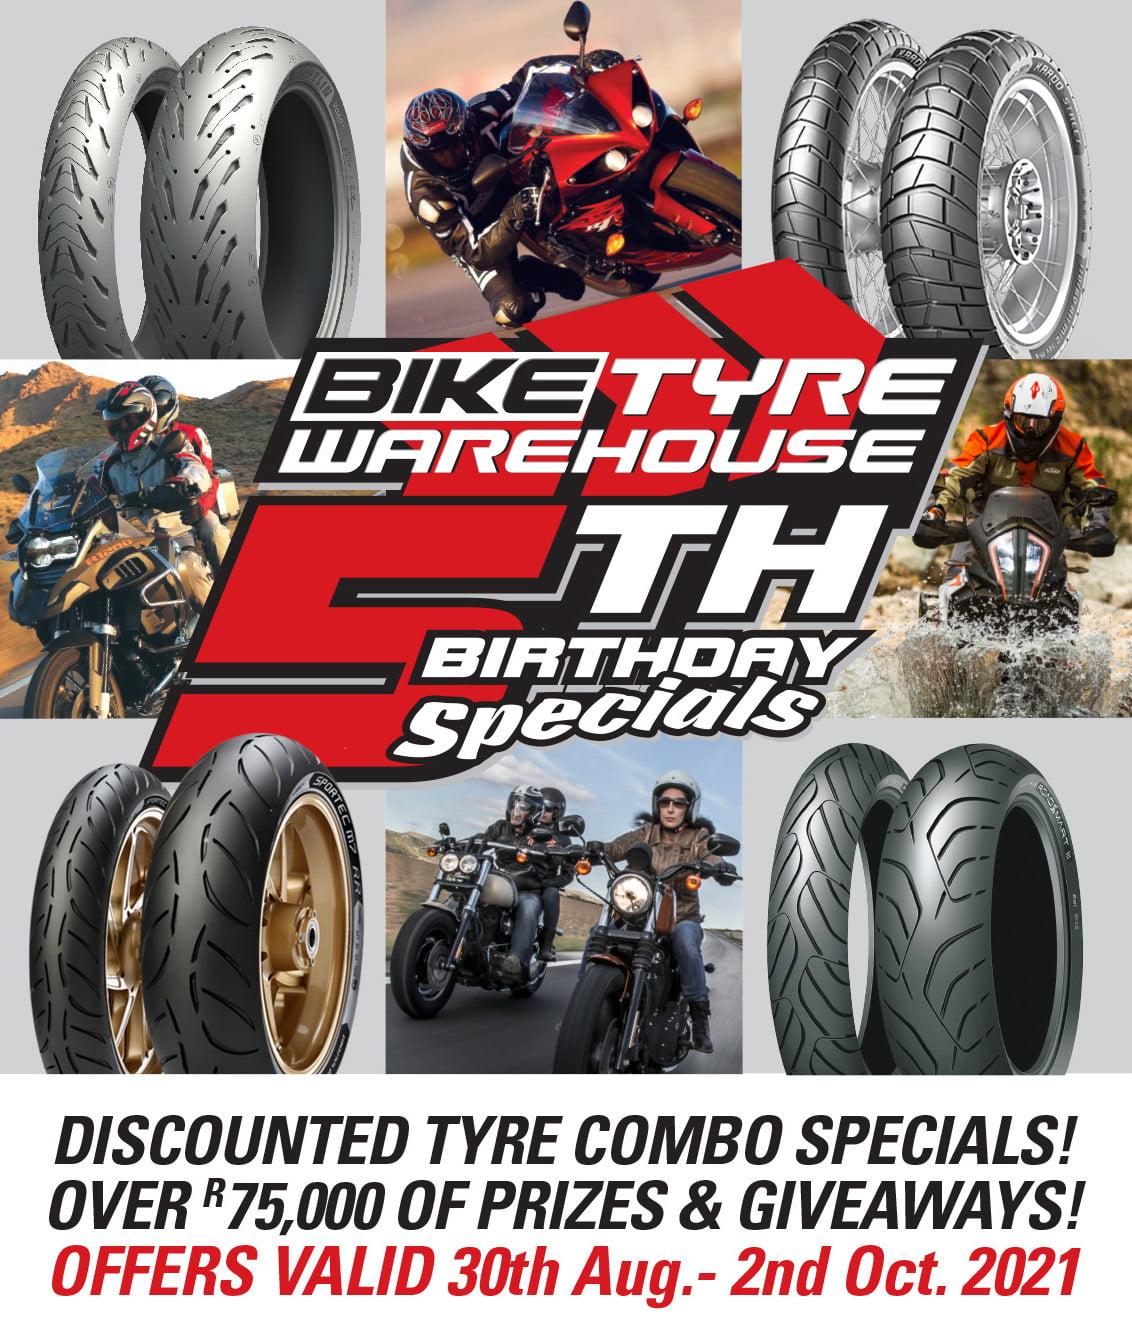 Bike Tyre Warehouse 5th Birthday Poster 001